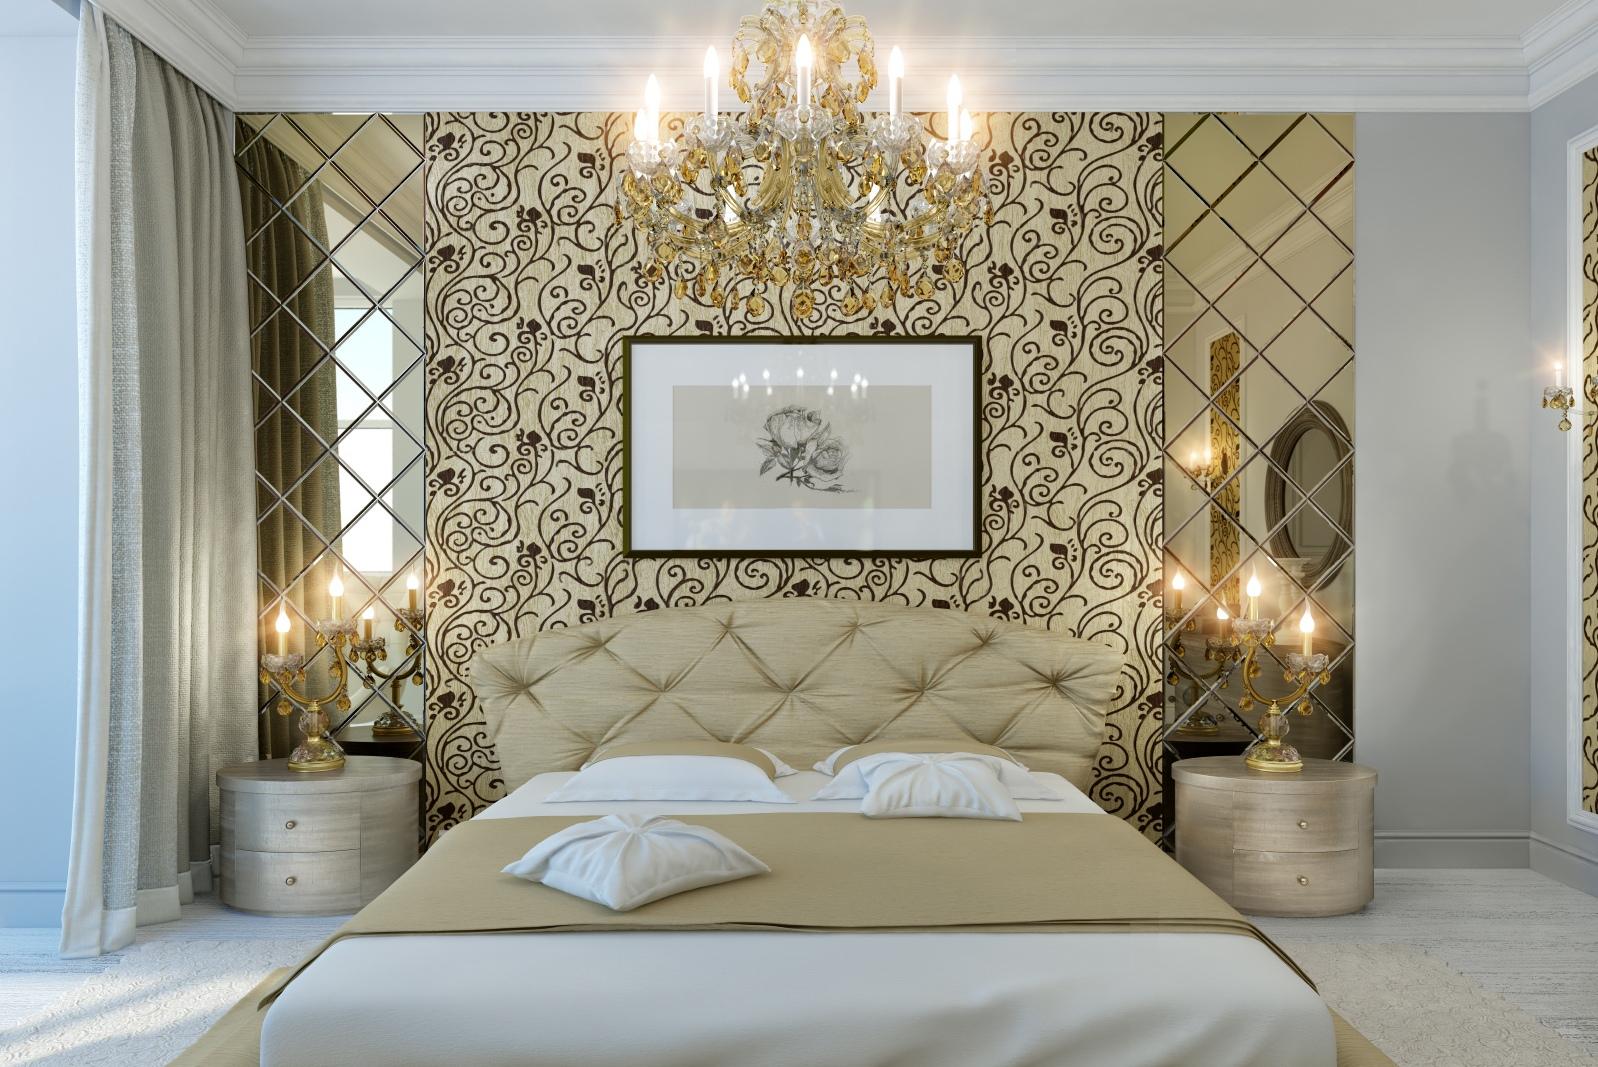 зеркальная спальня фото жареную утку луком